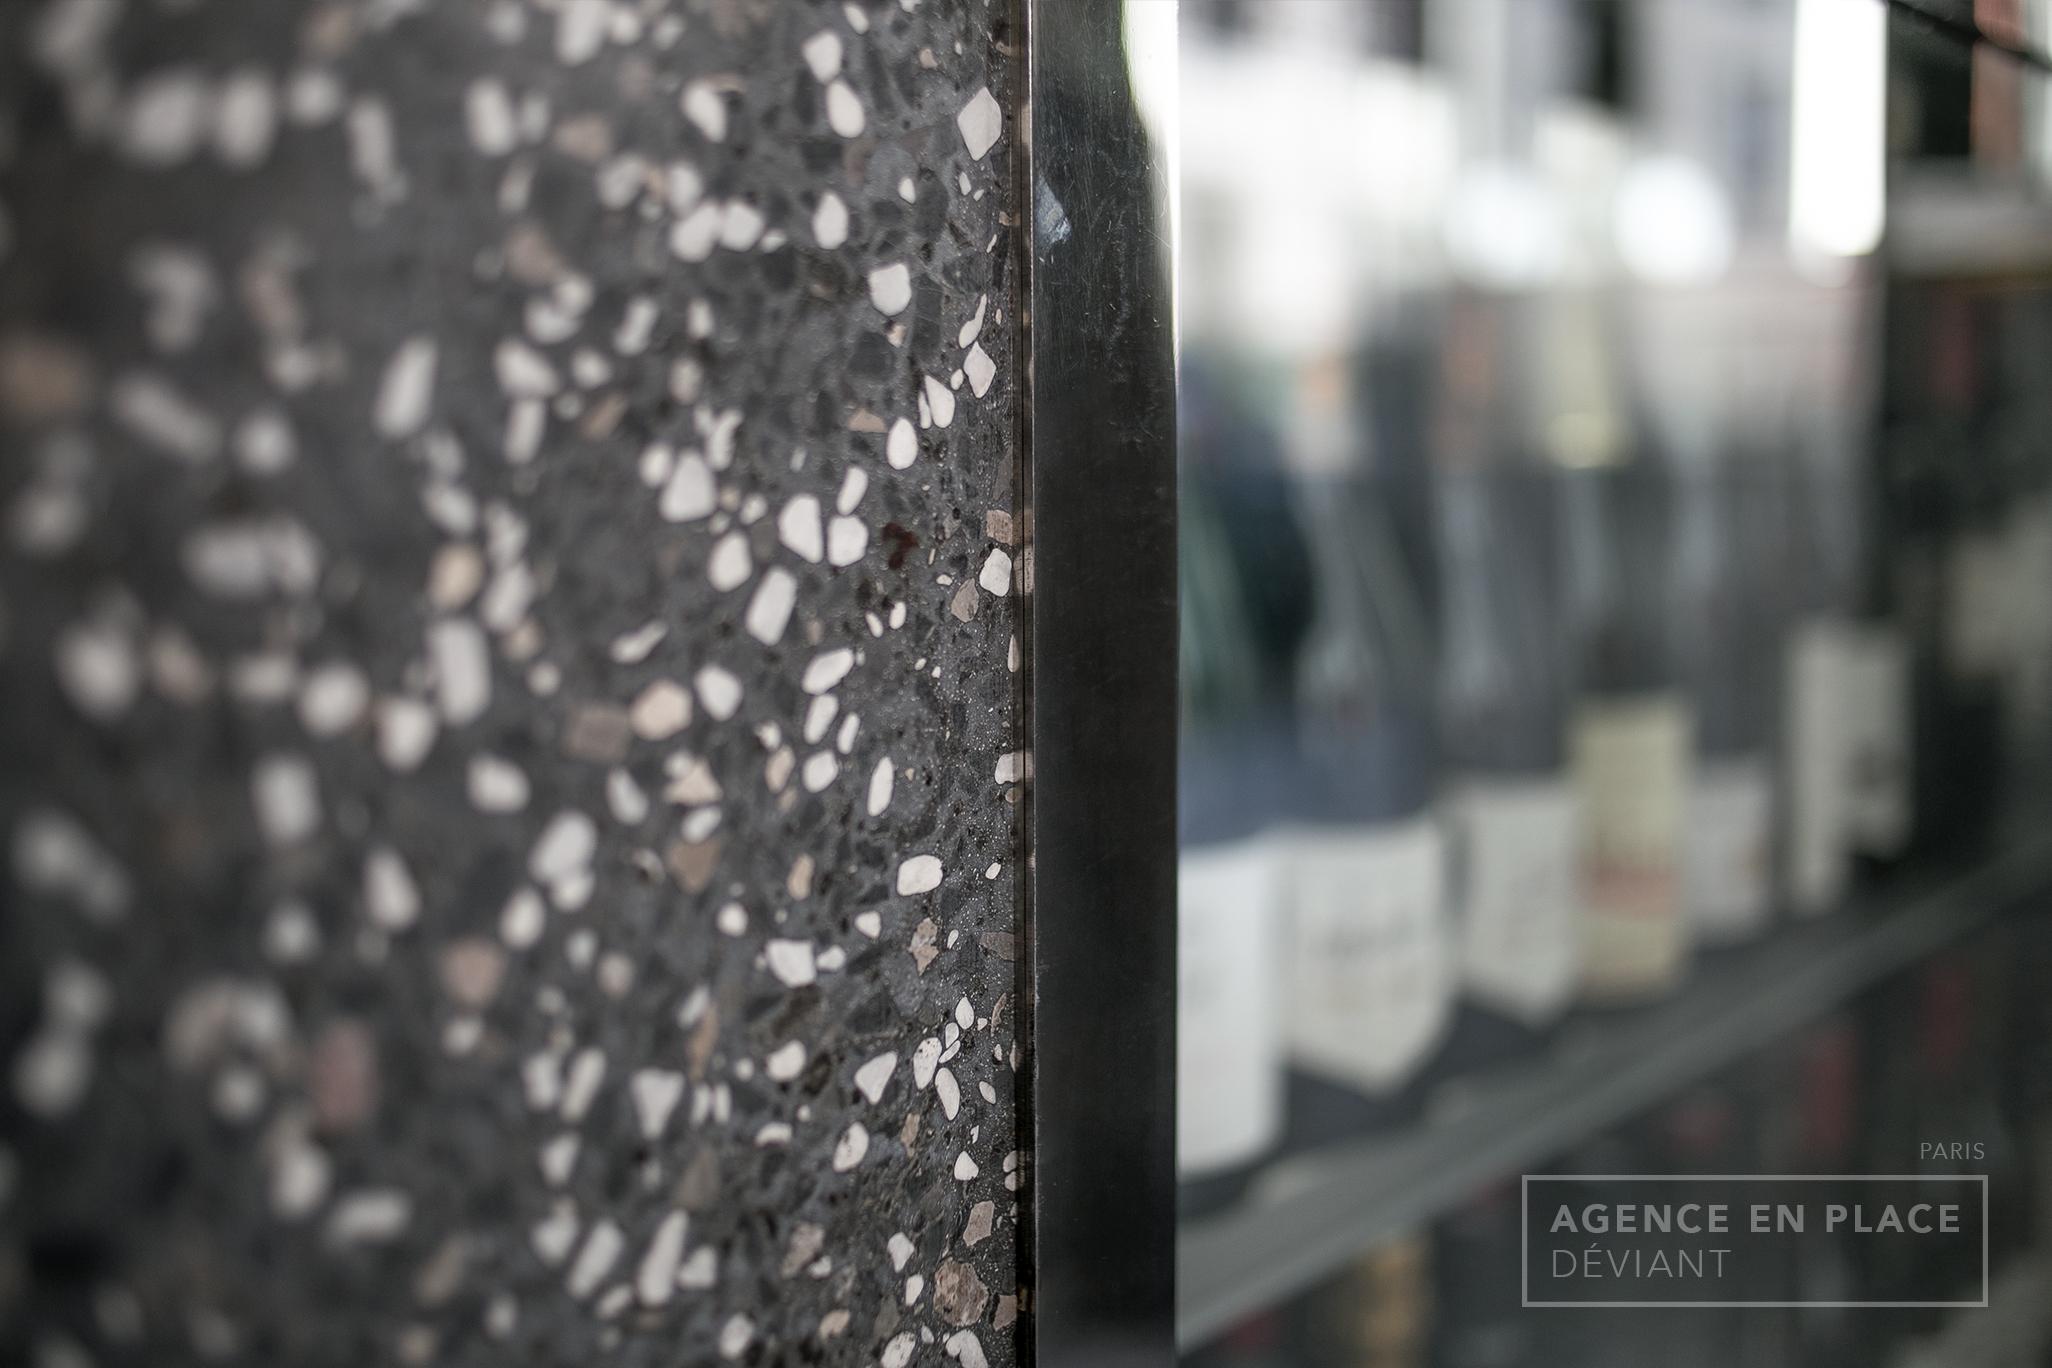 deviant-agenceenplace-winebar-003